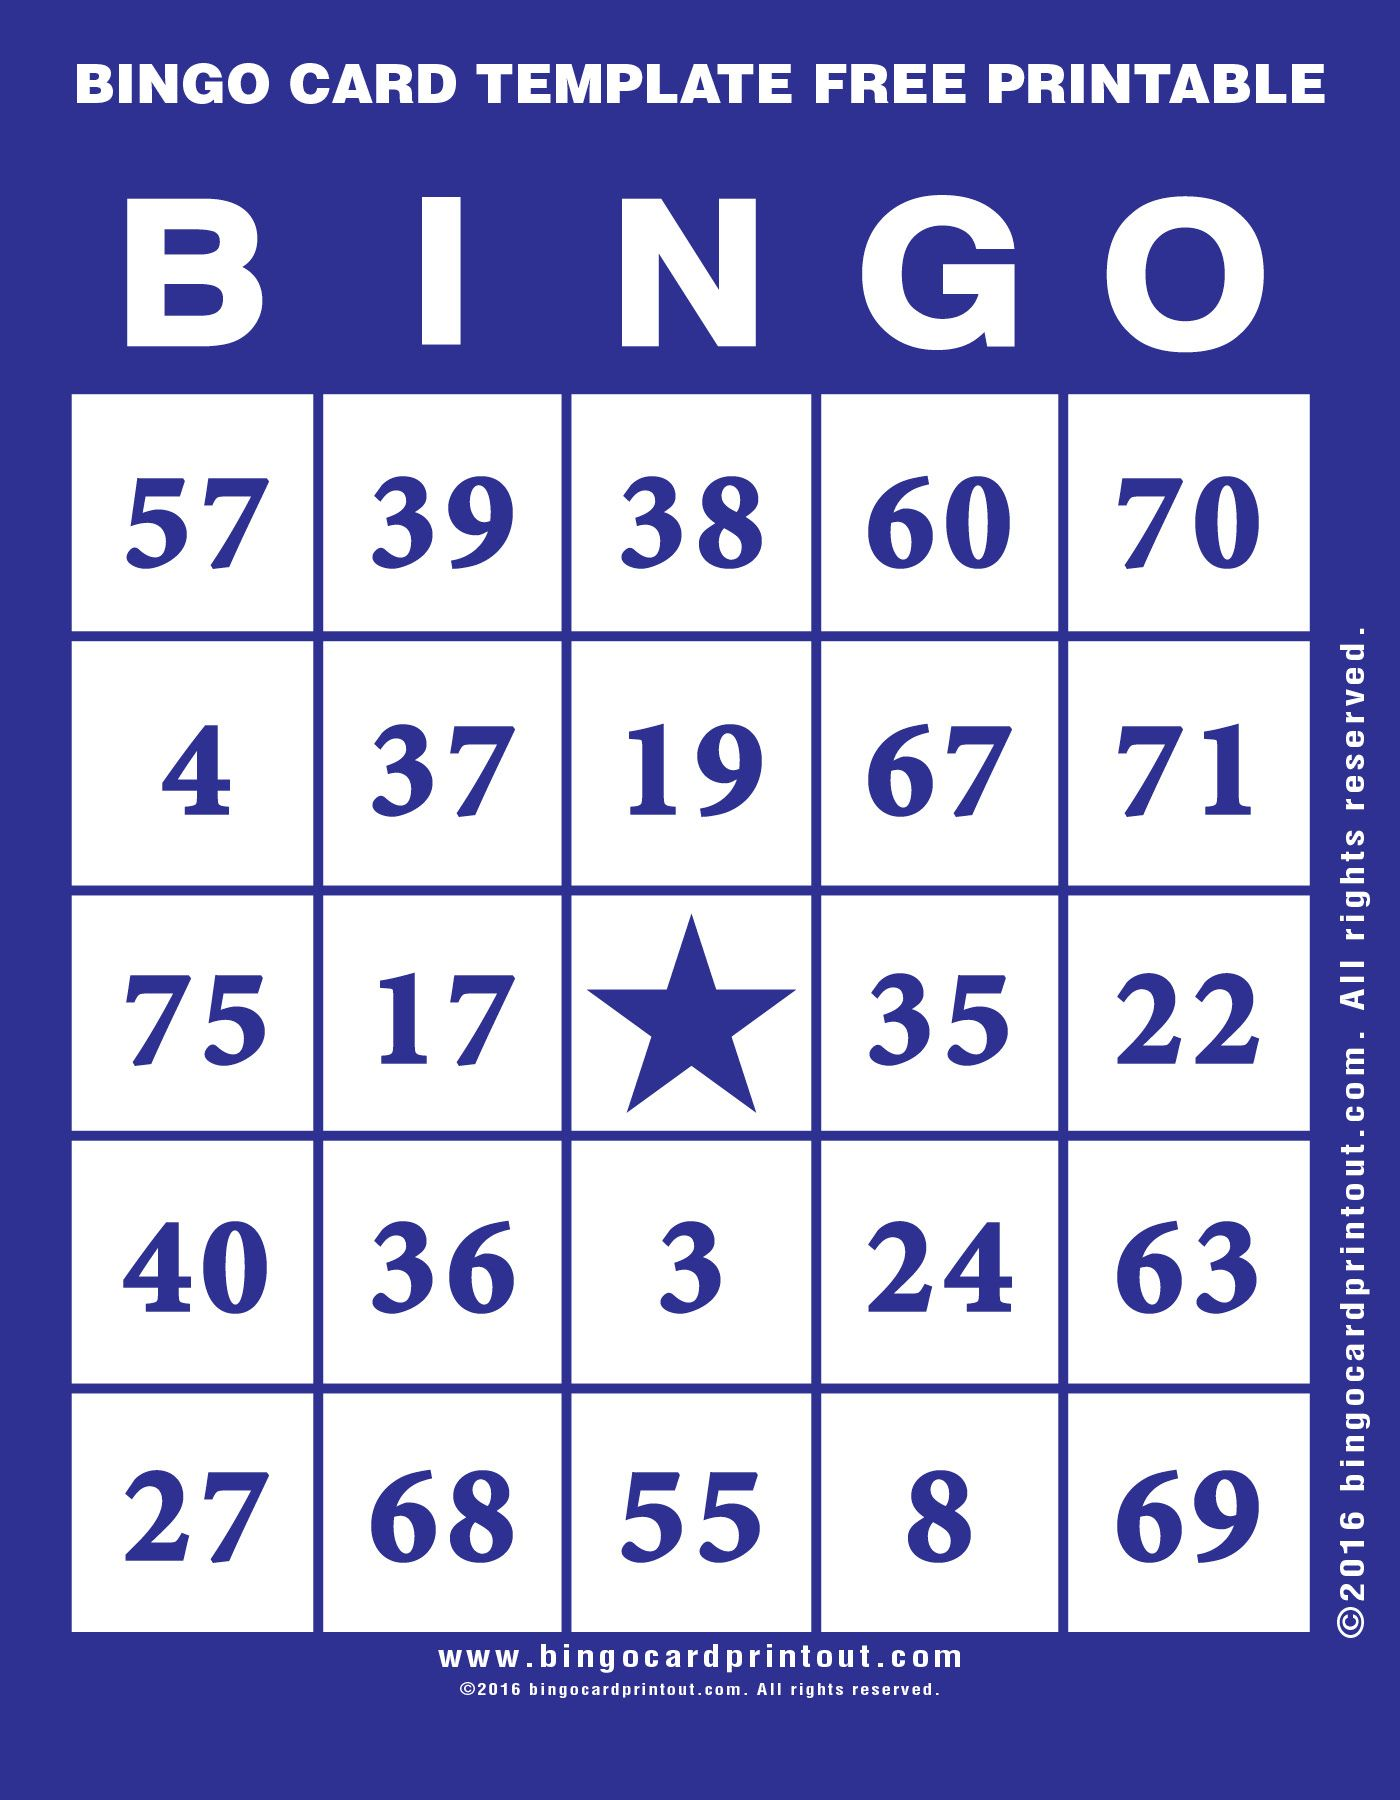 bingo card template free printable 6 bingo pinterest bingo